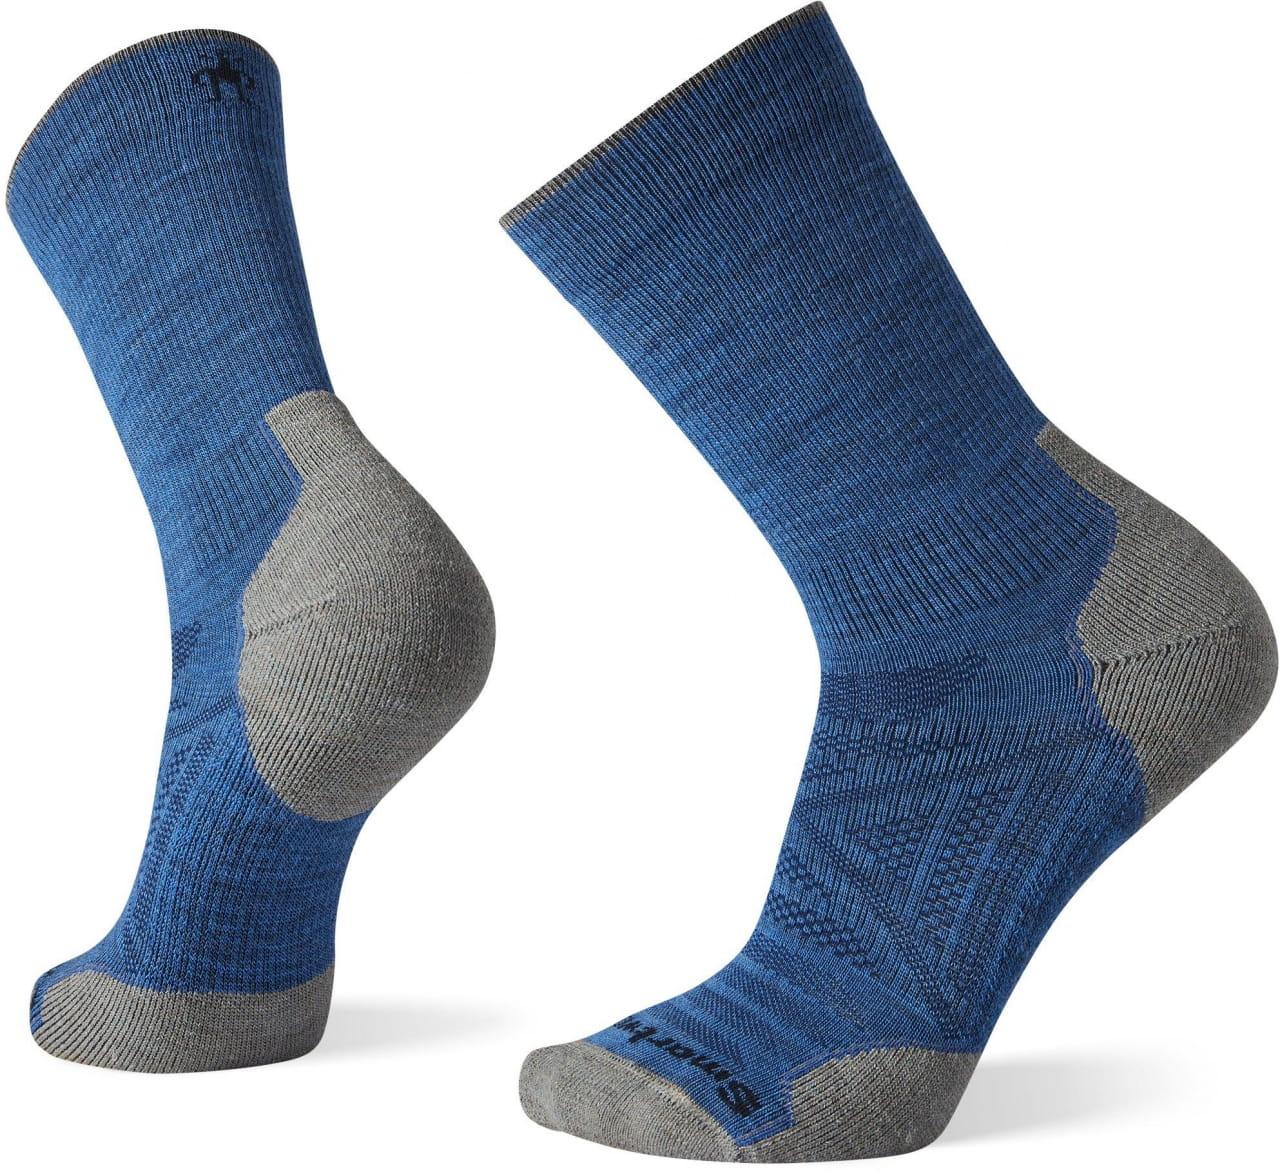 Unisexové ponožky Smartwool Phd Outdoor Light Cre